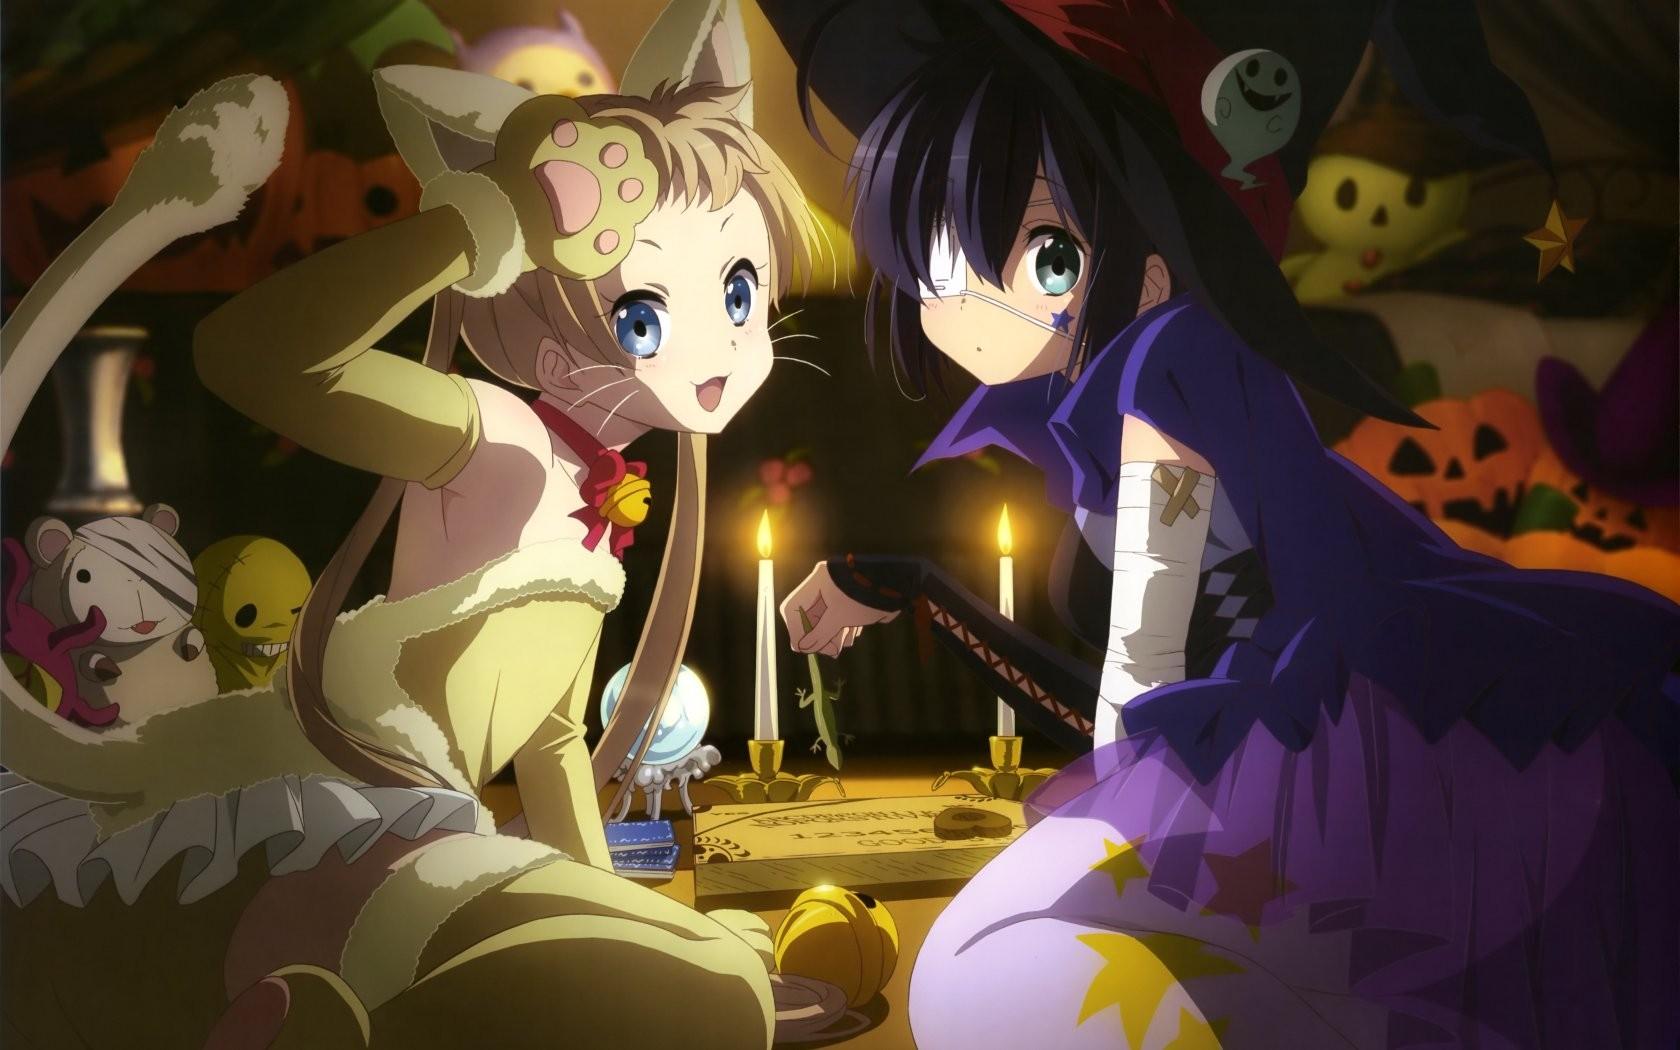 #animal Ears, #catsuits, #blue Eyes, #takanashi Rikka, - Chuunibyou Demo Koi Ga Shitai , HD Wallpaper & Backgrounds